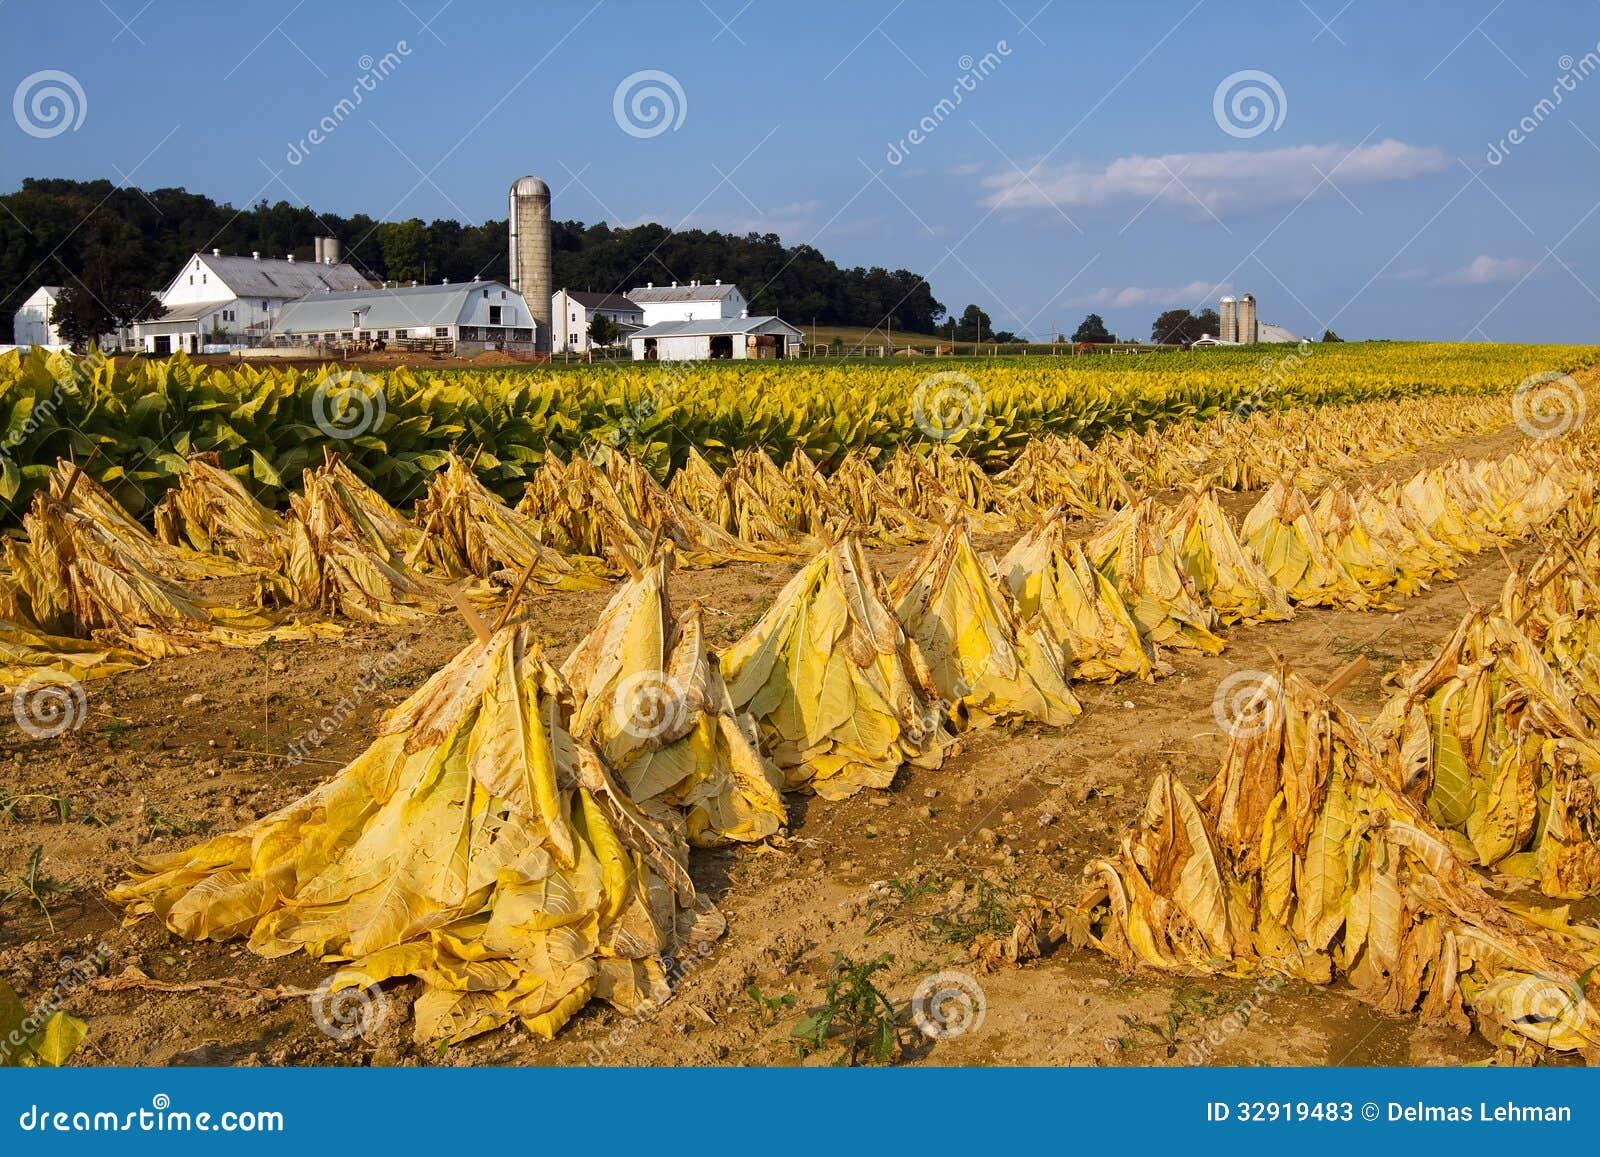 Tobacco Harvest Stock Photos Image 32919483